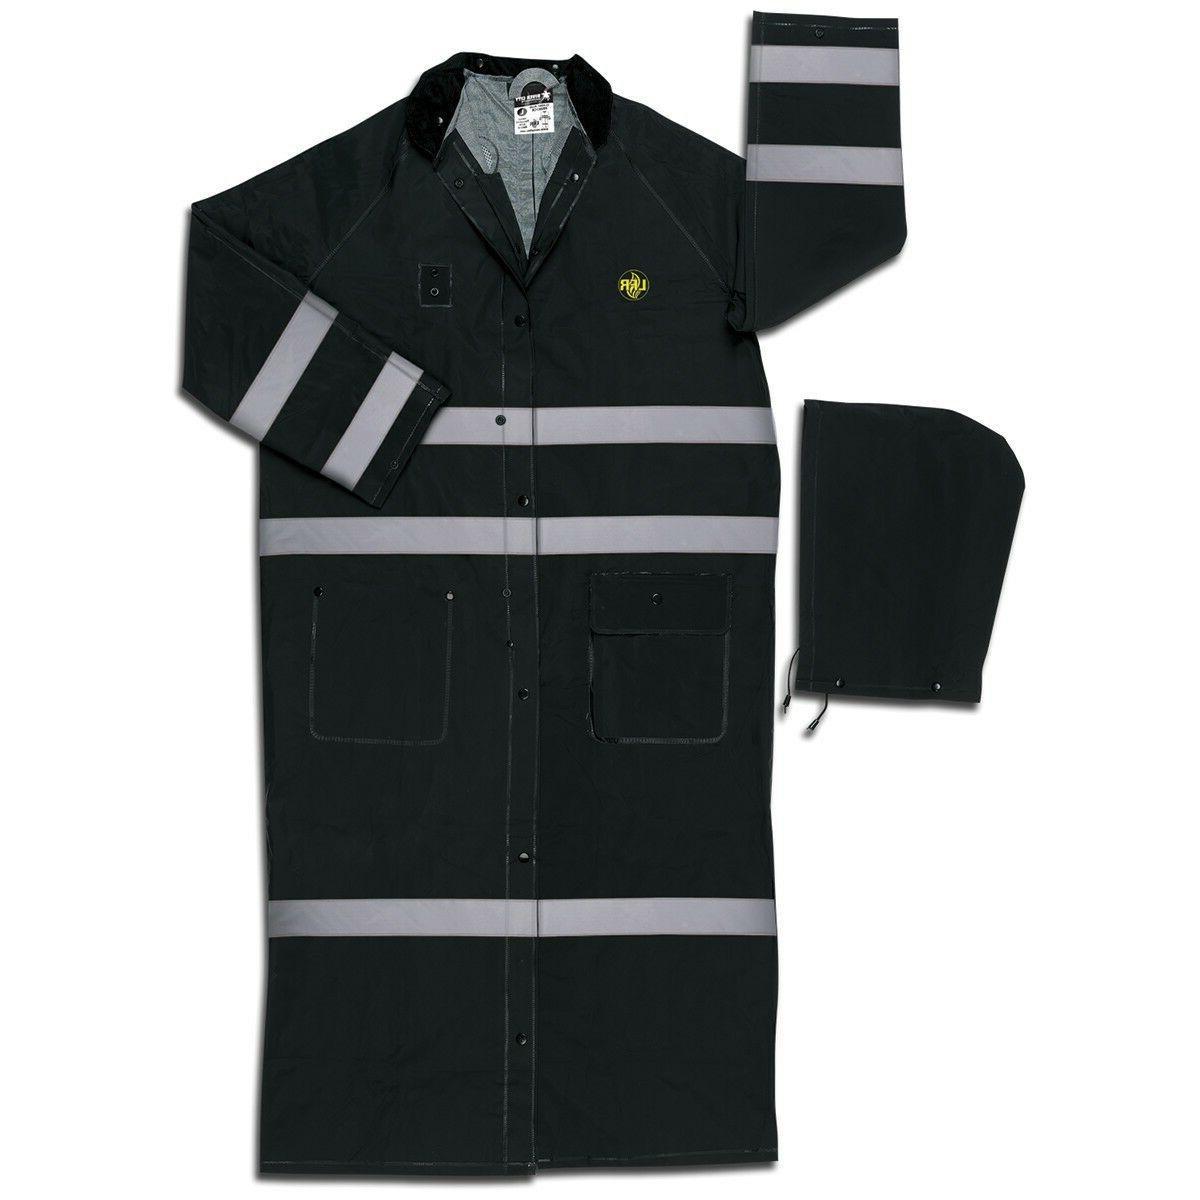 60 inch reflective raincoat with detachable hood